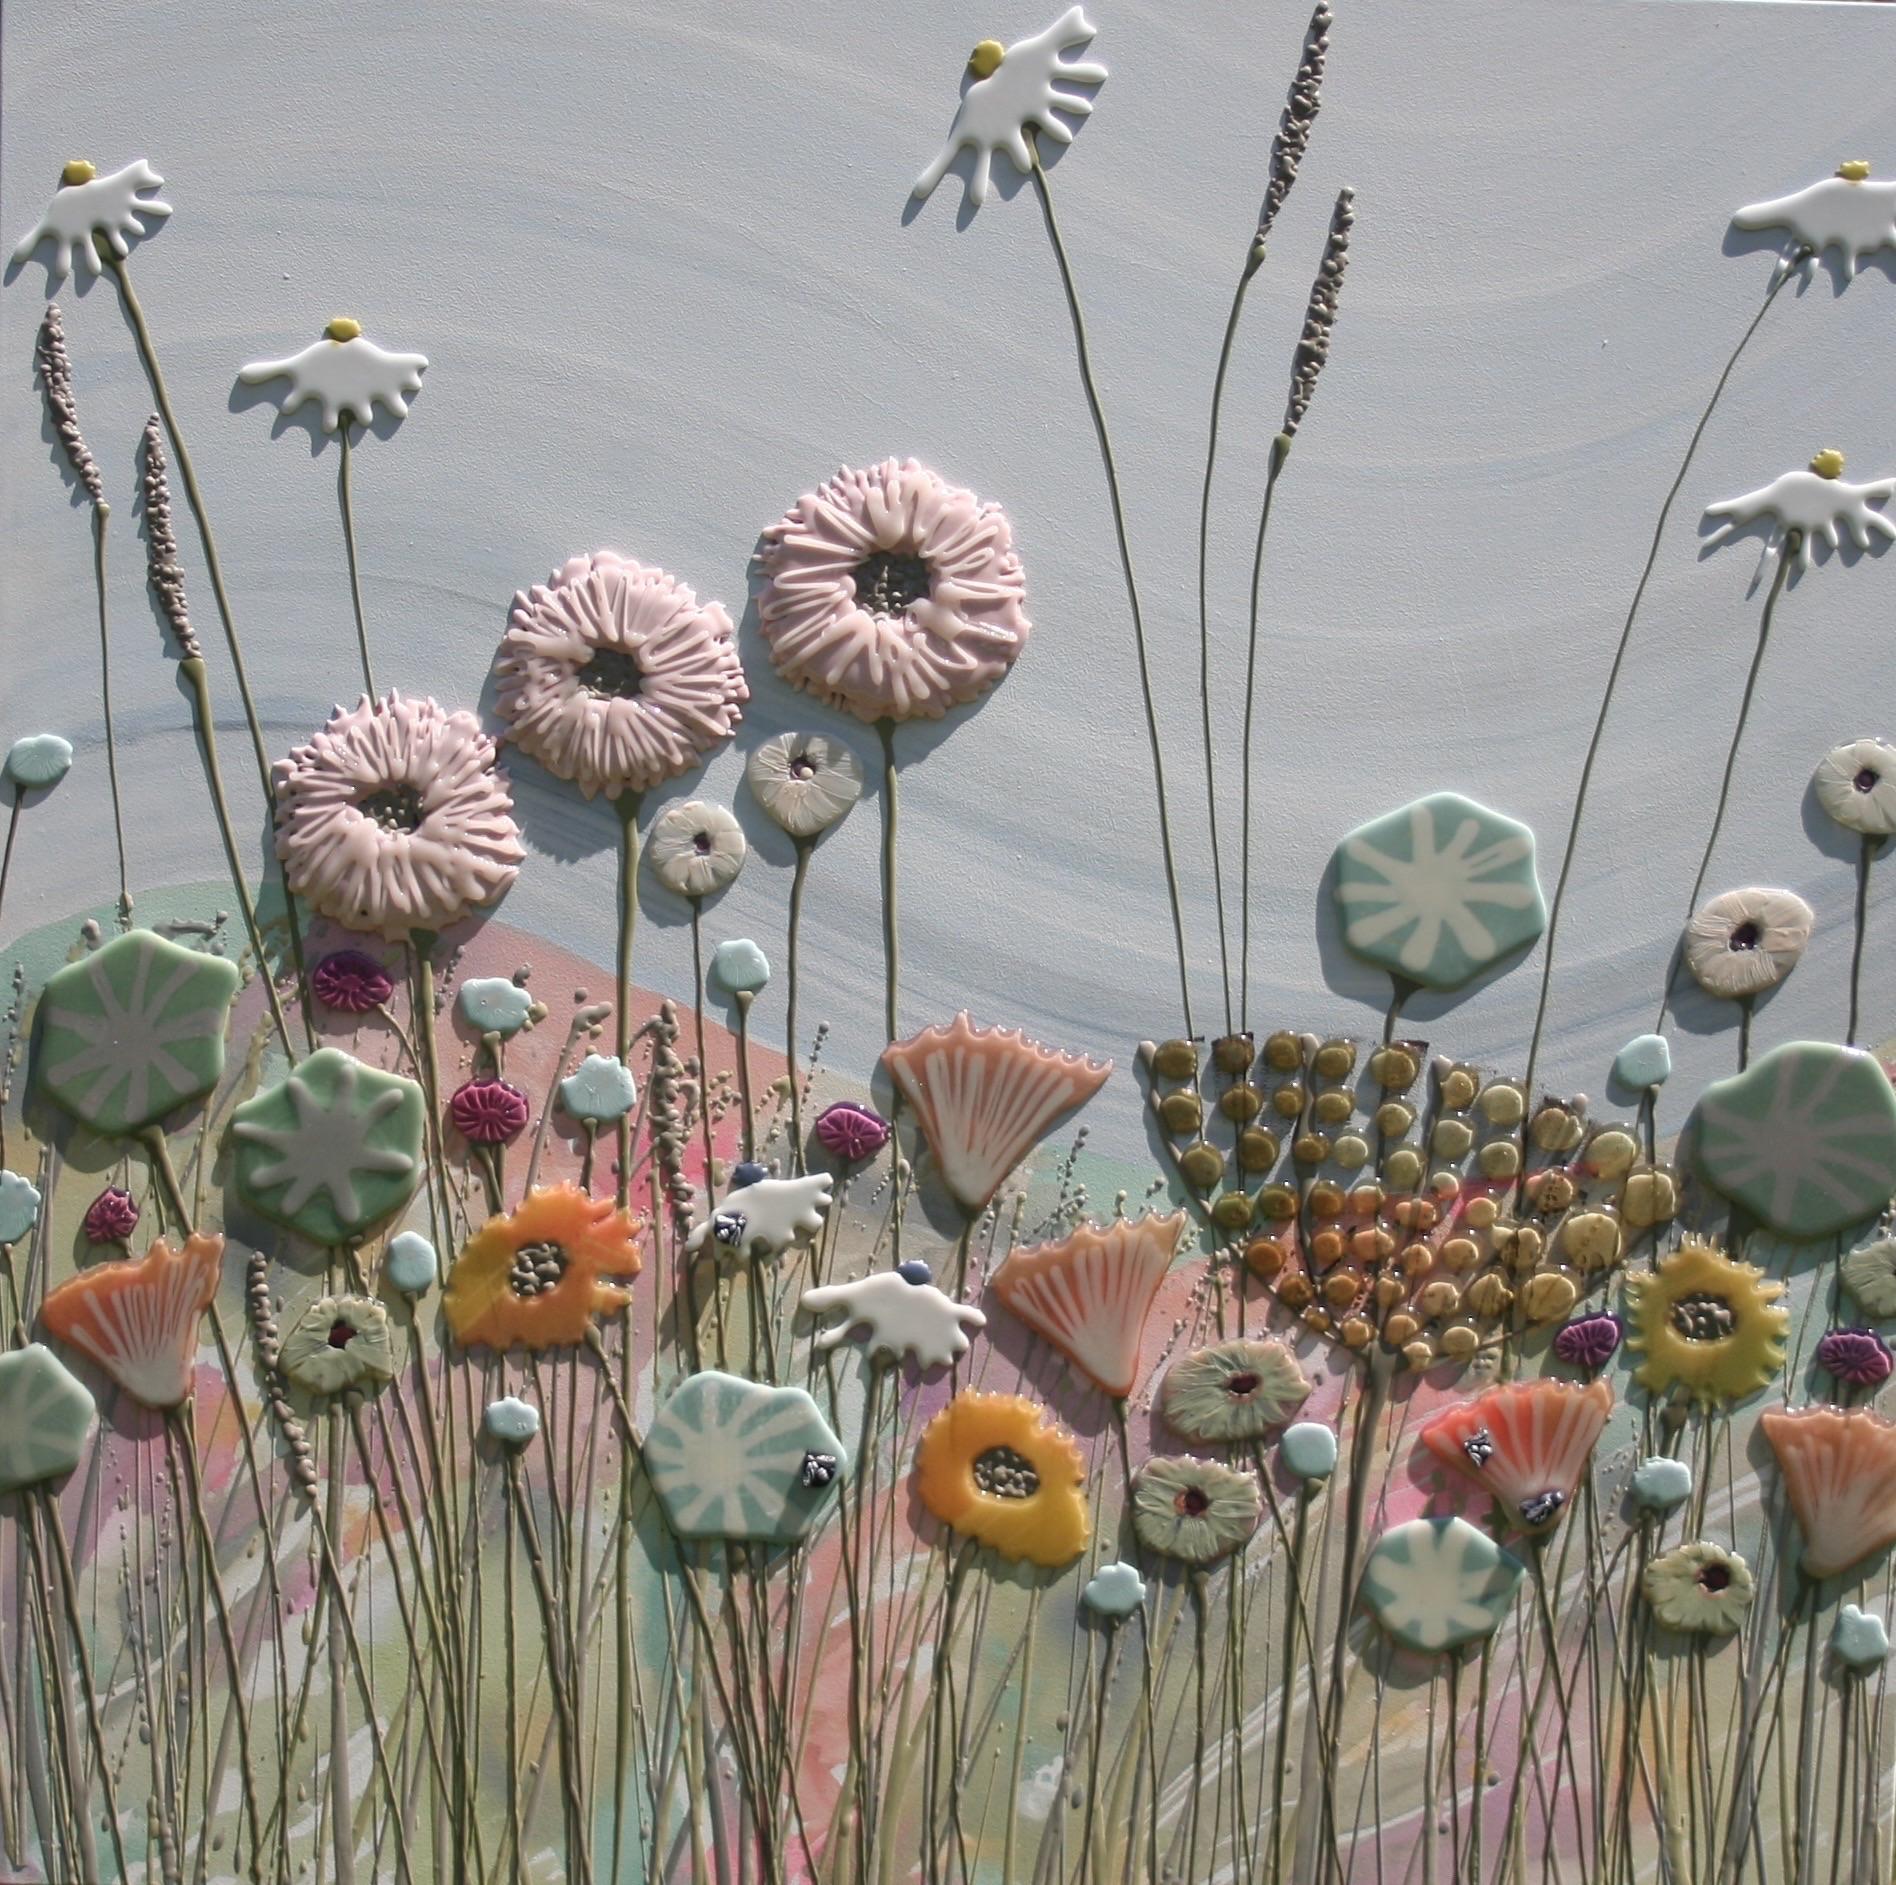 Pale Pink & Green Meadow - 100cm x 100cm